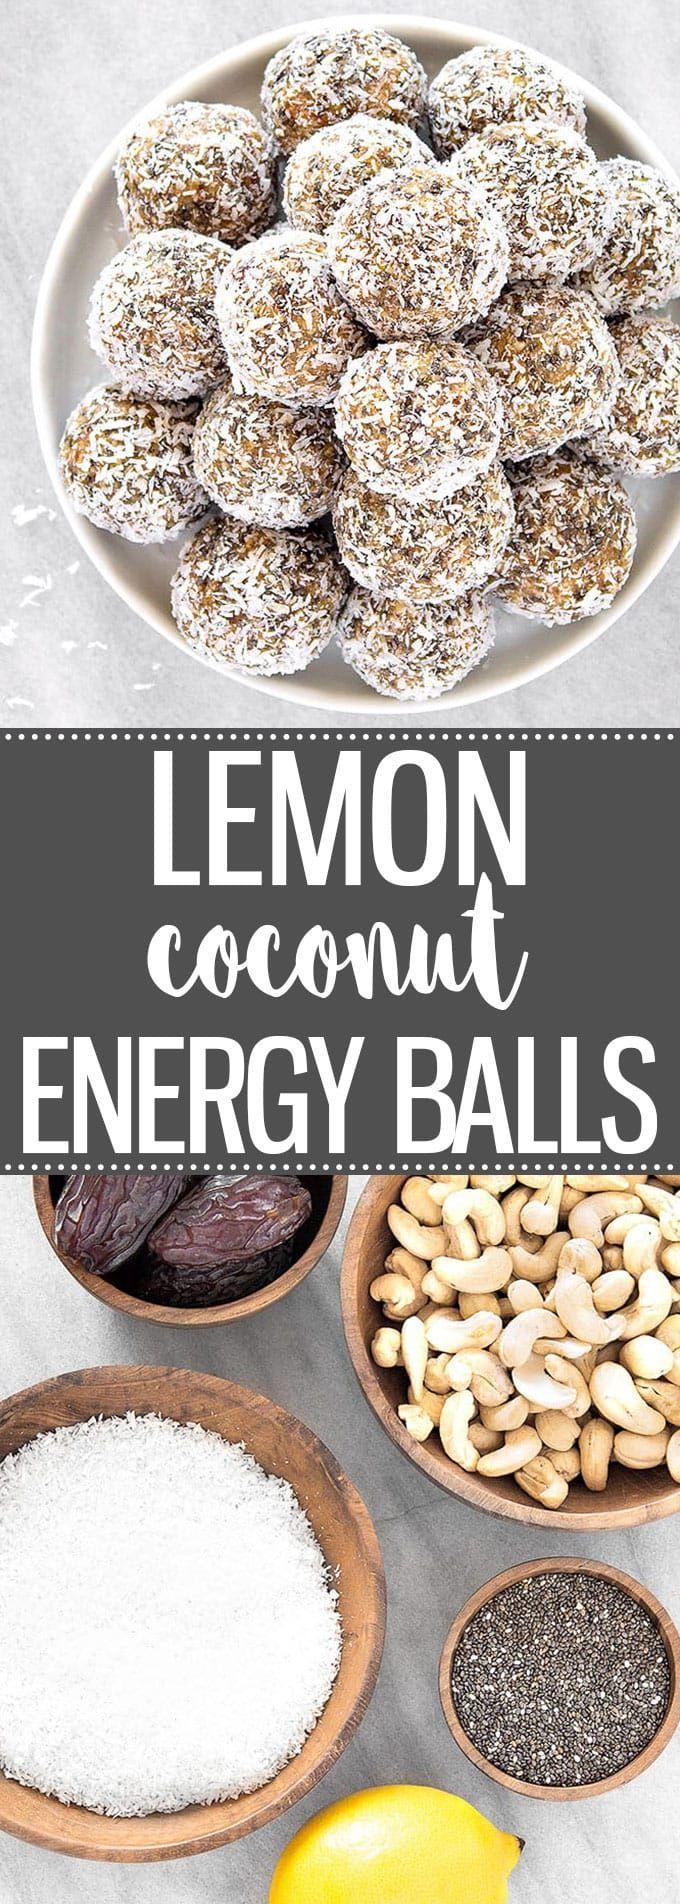 Healthy Lemon Coconut Energy Balls - No-bake snacks packed with cashew nuts, coconut, dates, chia seeds, lemon. Vegan, Paleo, Gluten Free @ReTweetNGro